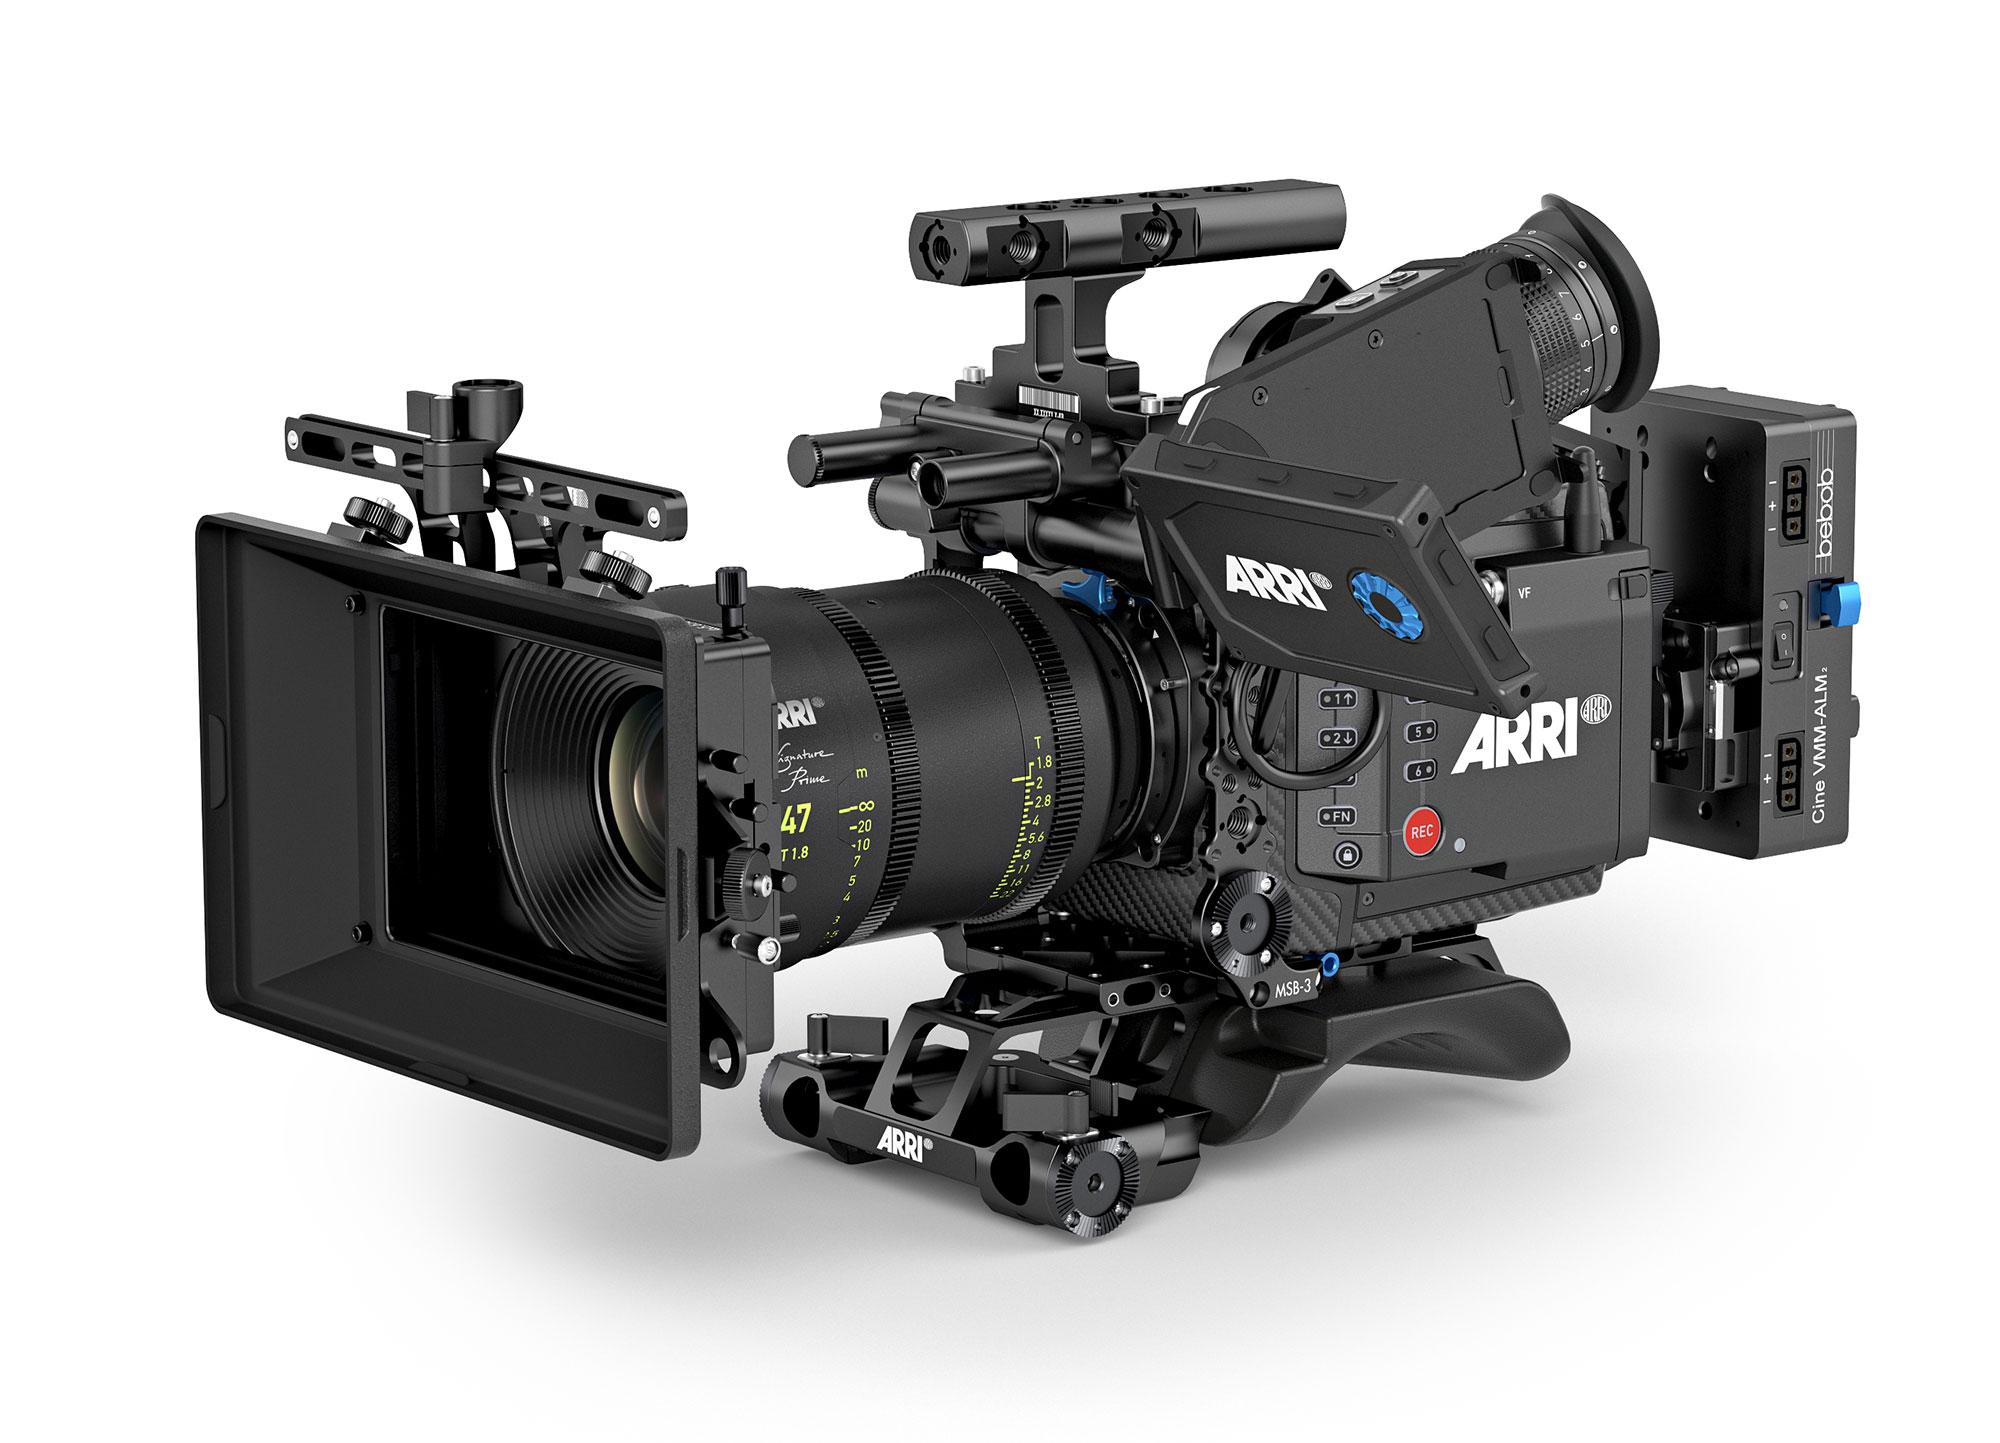 ARRI: Netflix Camera Production Guide for ALEXA Mini LF - SUPs for ALEXA Mini LF and ALEXA LF